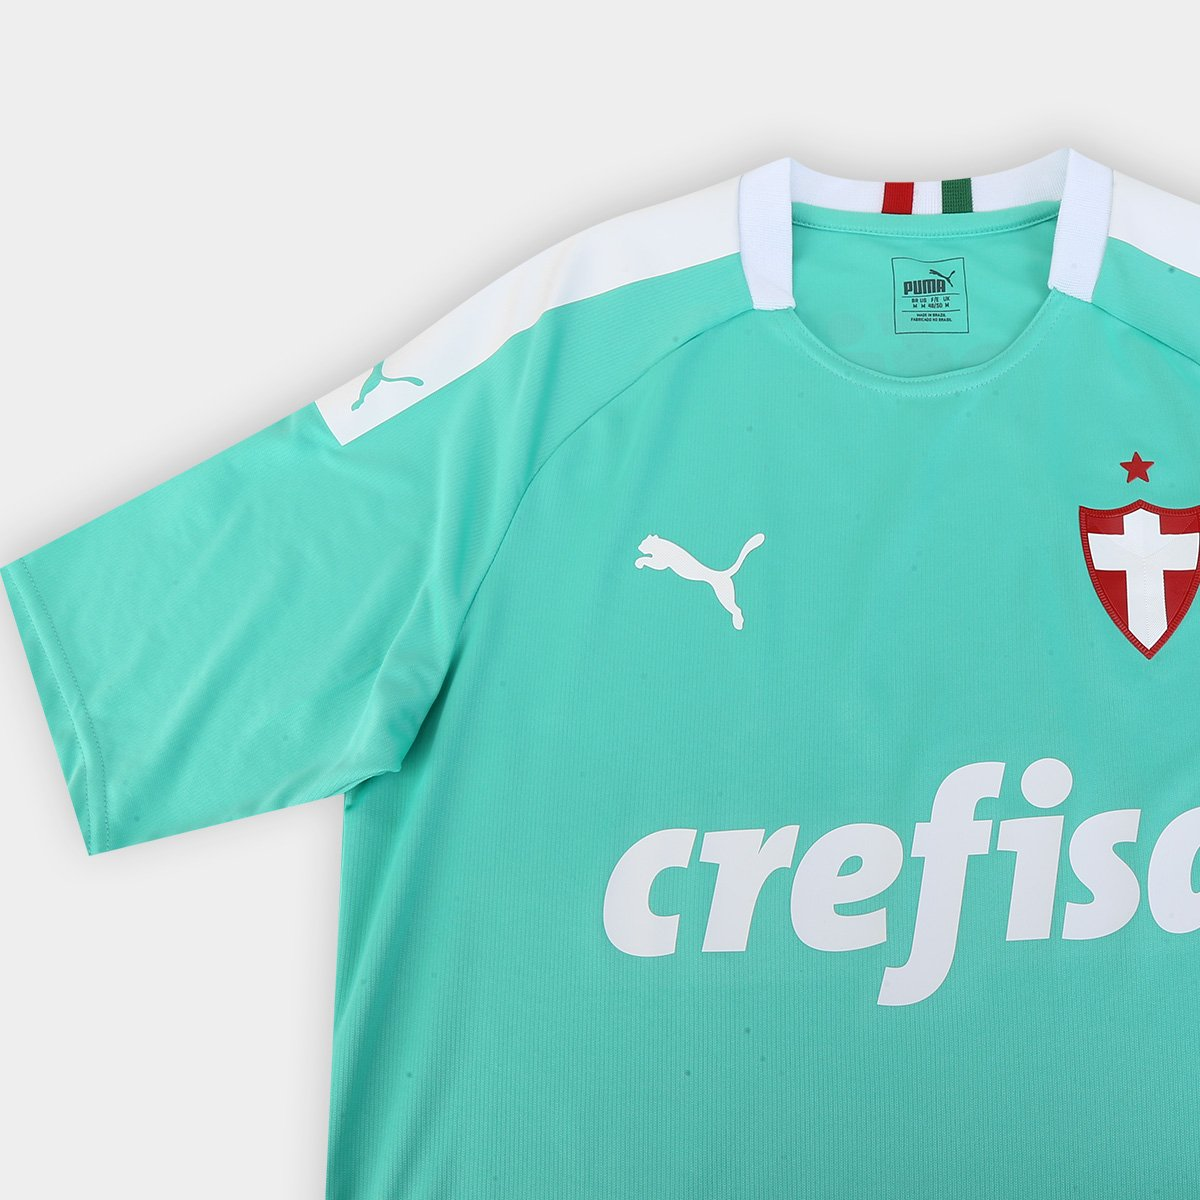 Camisa Palmeiras III 19/20 s/n° - Torcedor Puma Masculina - Tam: G - 3